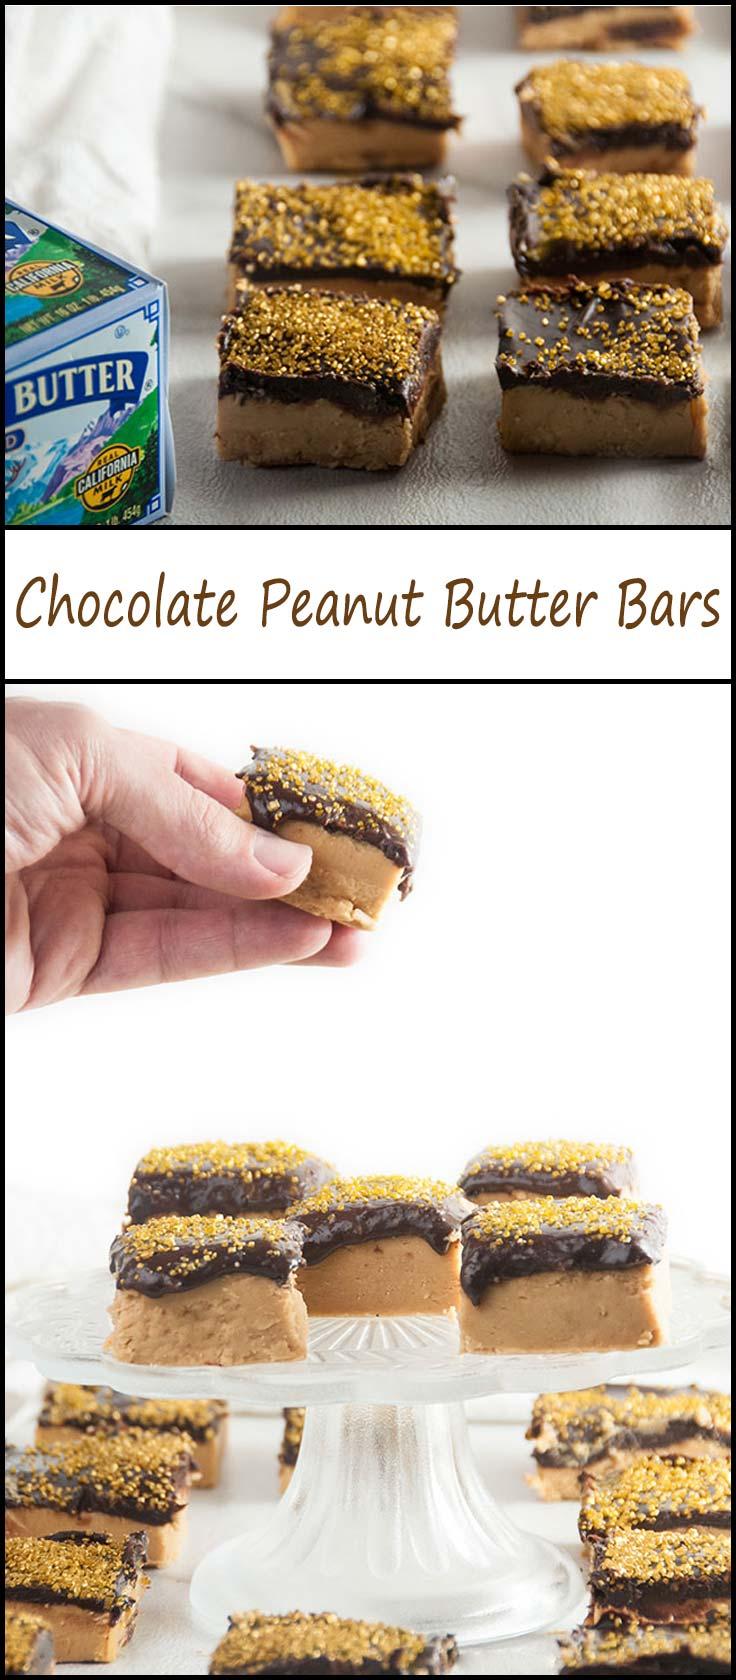 No Bake Chocolate Peanut Butter Bars from www.seasonedsprinkles.com